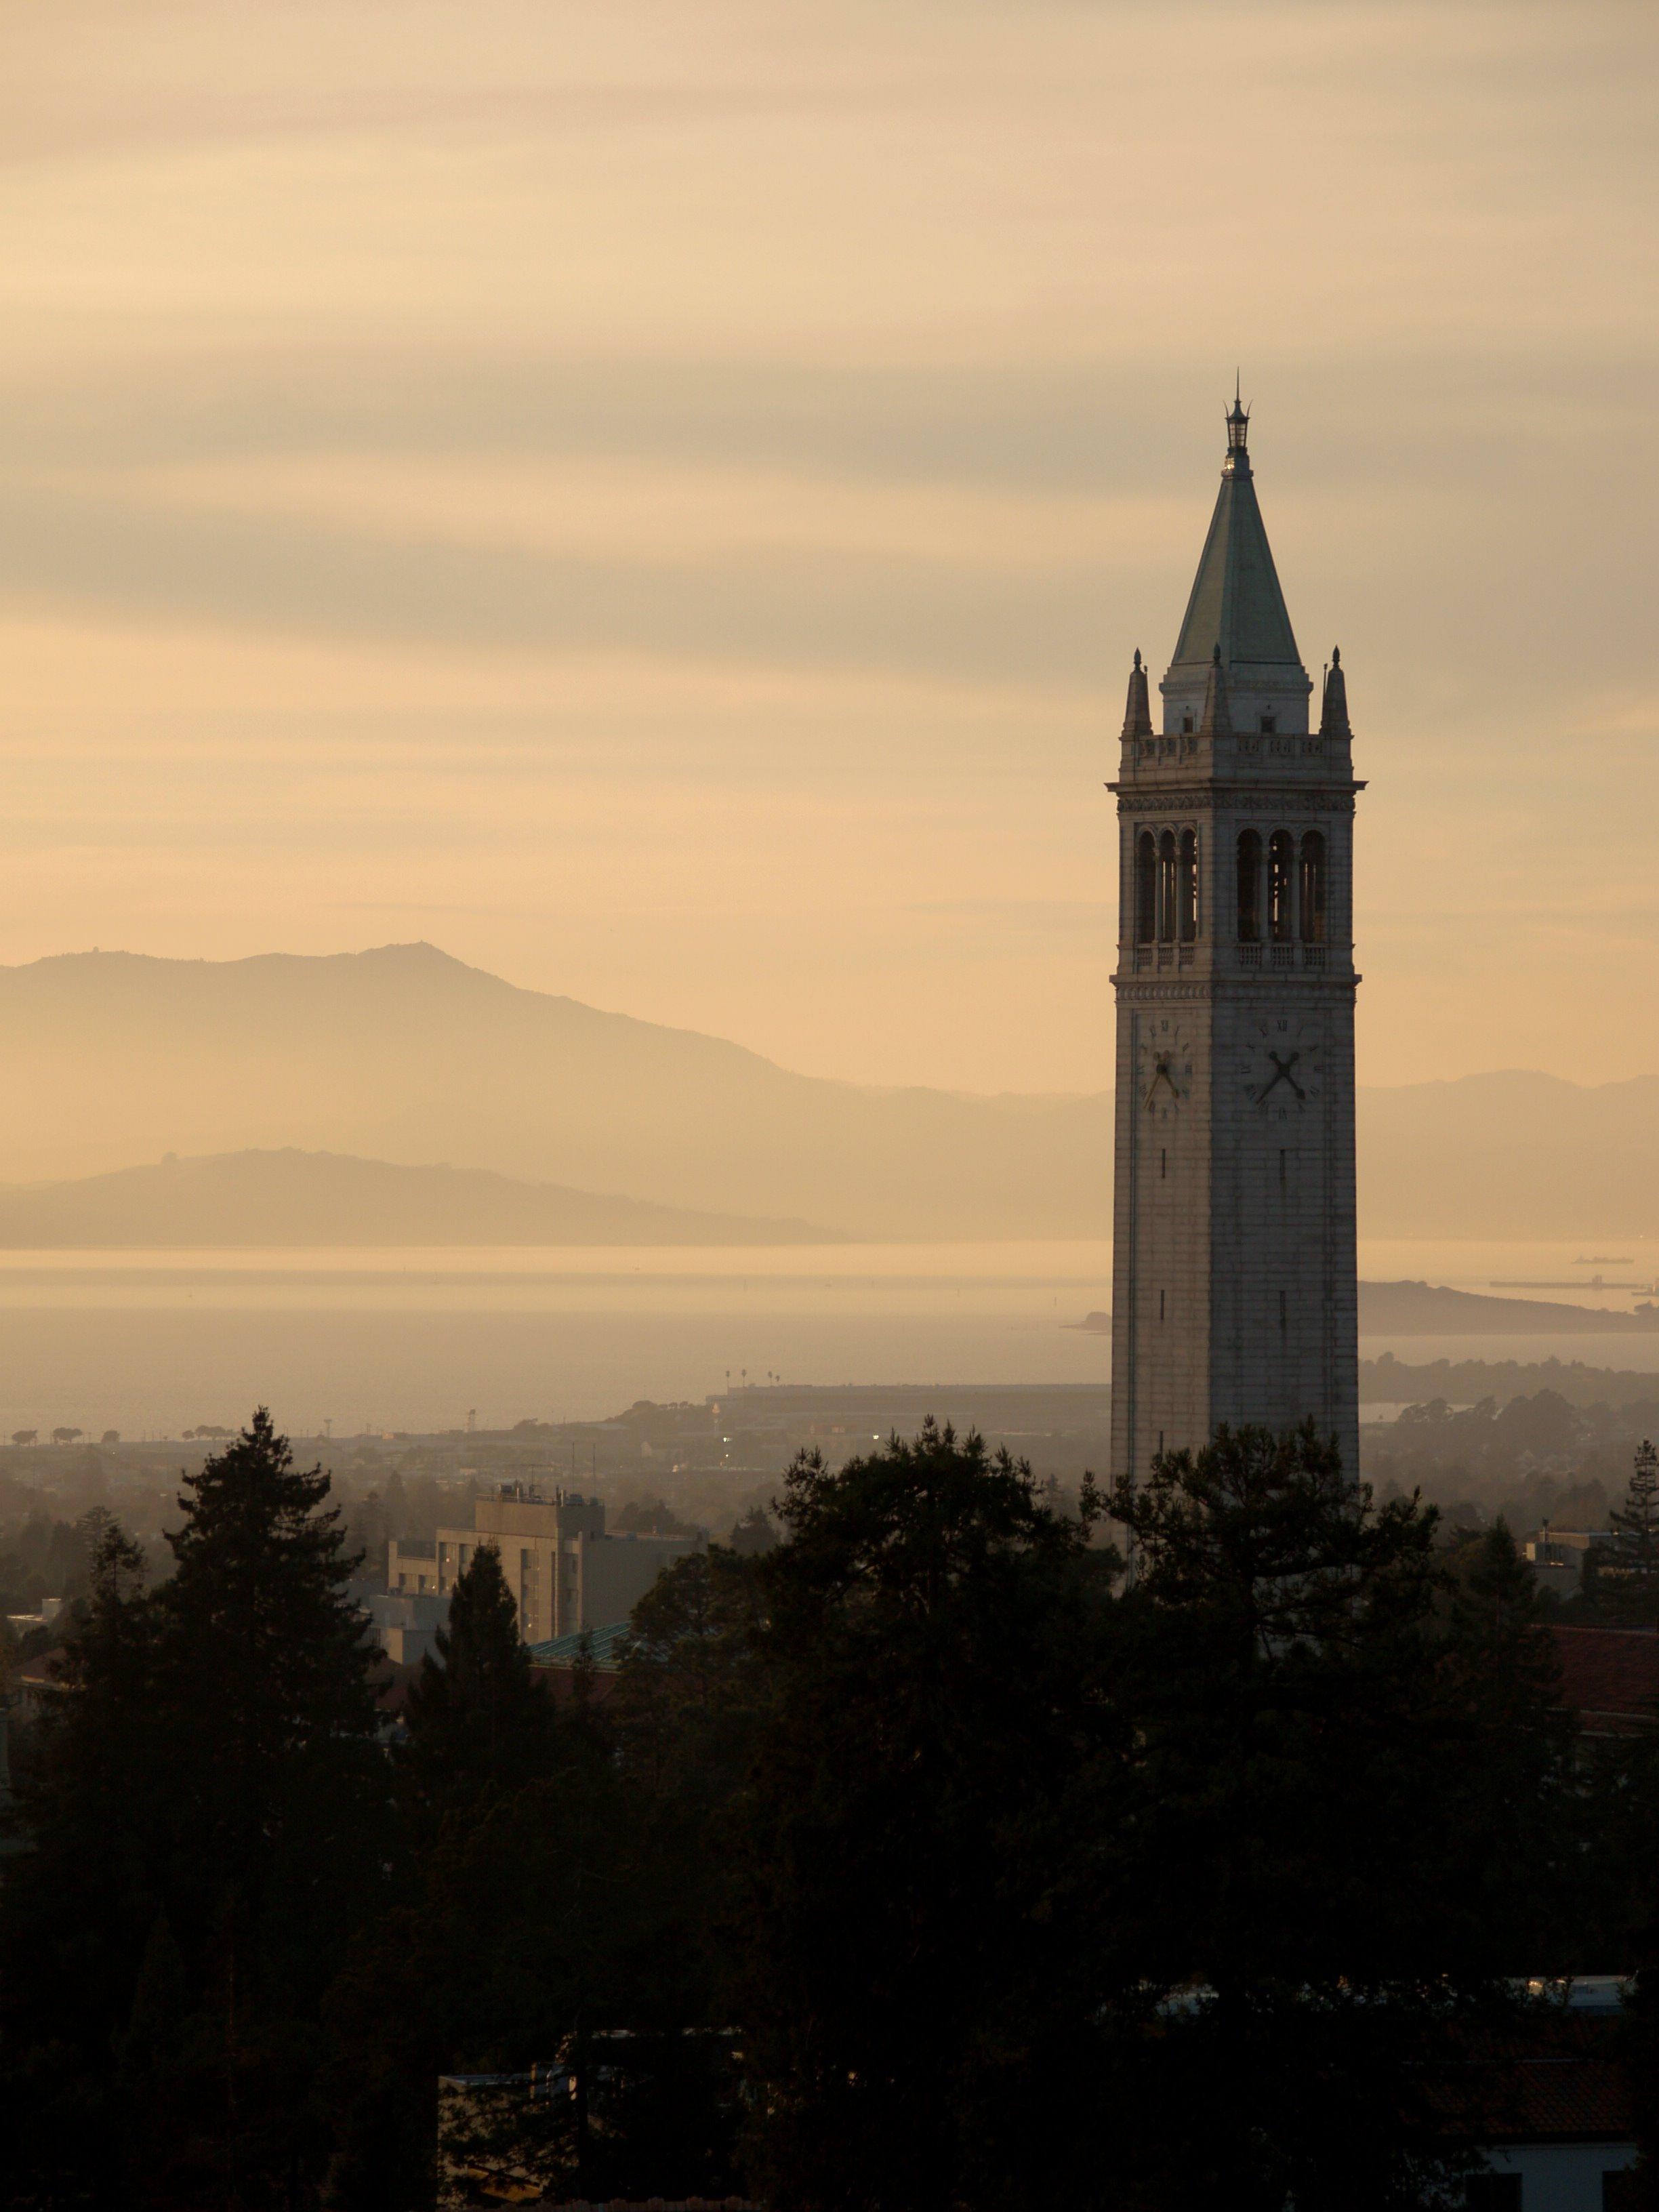 Sather Tower, Университет Беркли, США